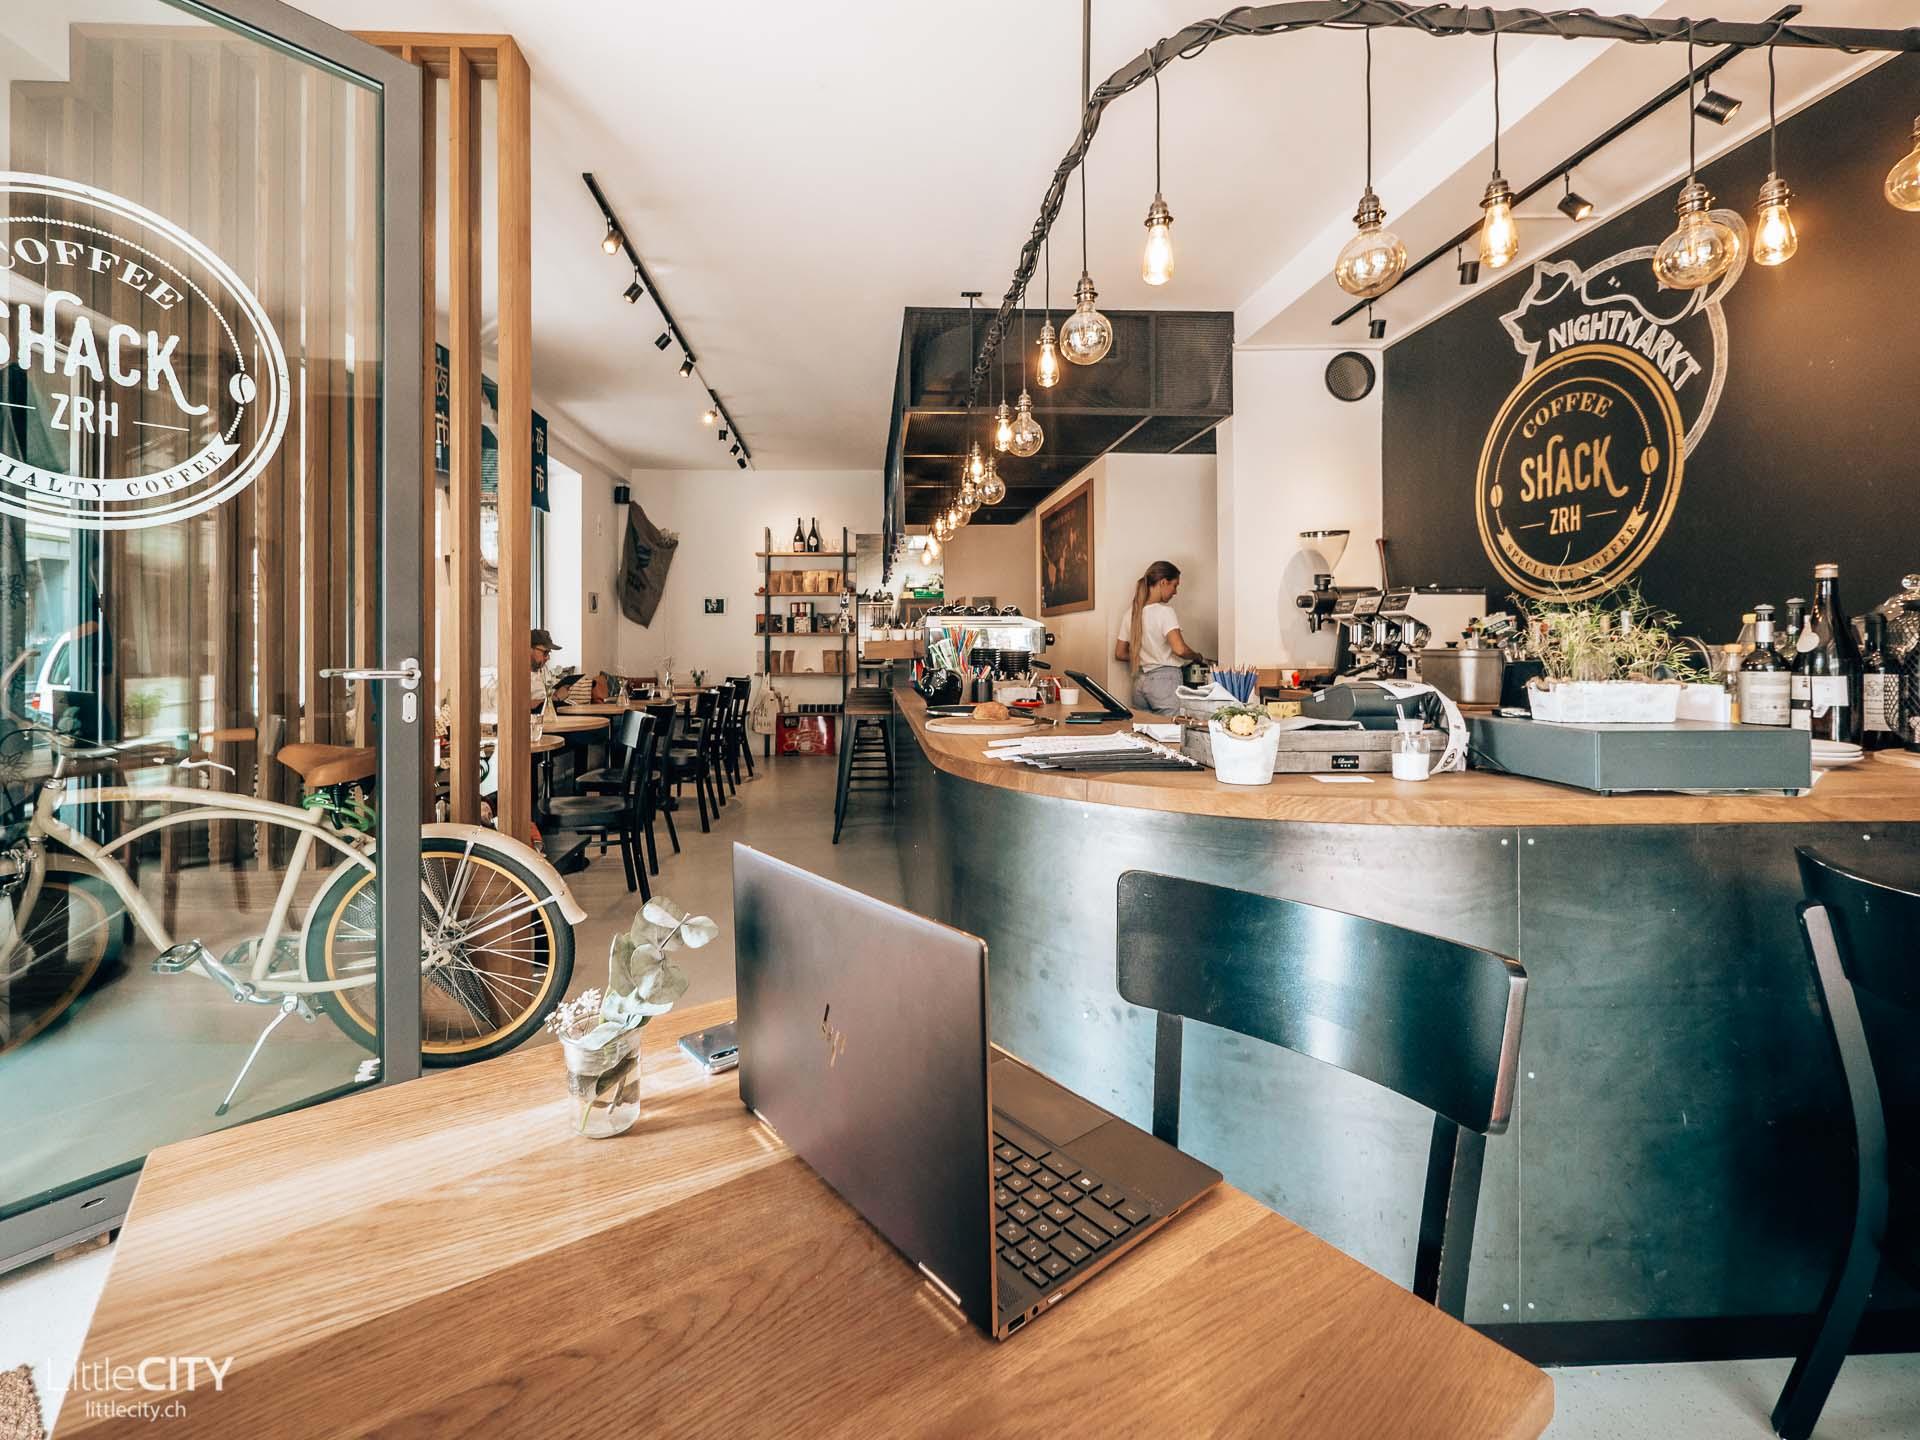 Café Shack Zürich Kaffee Tipp